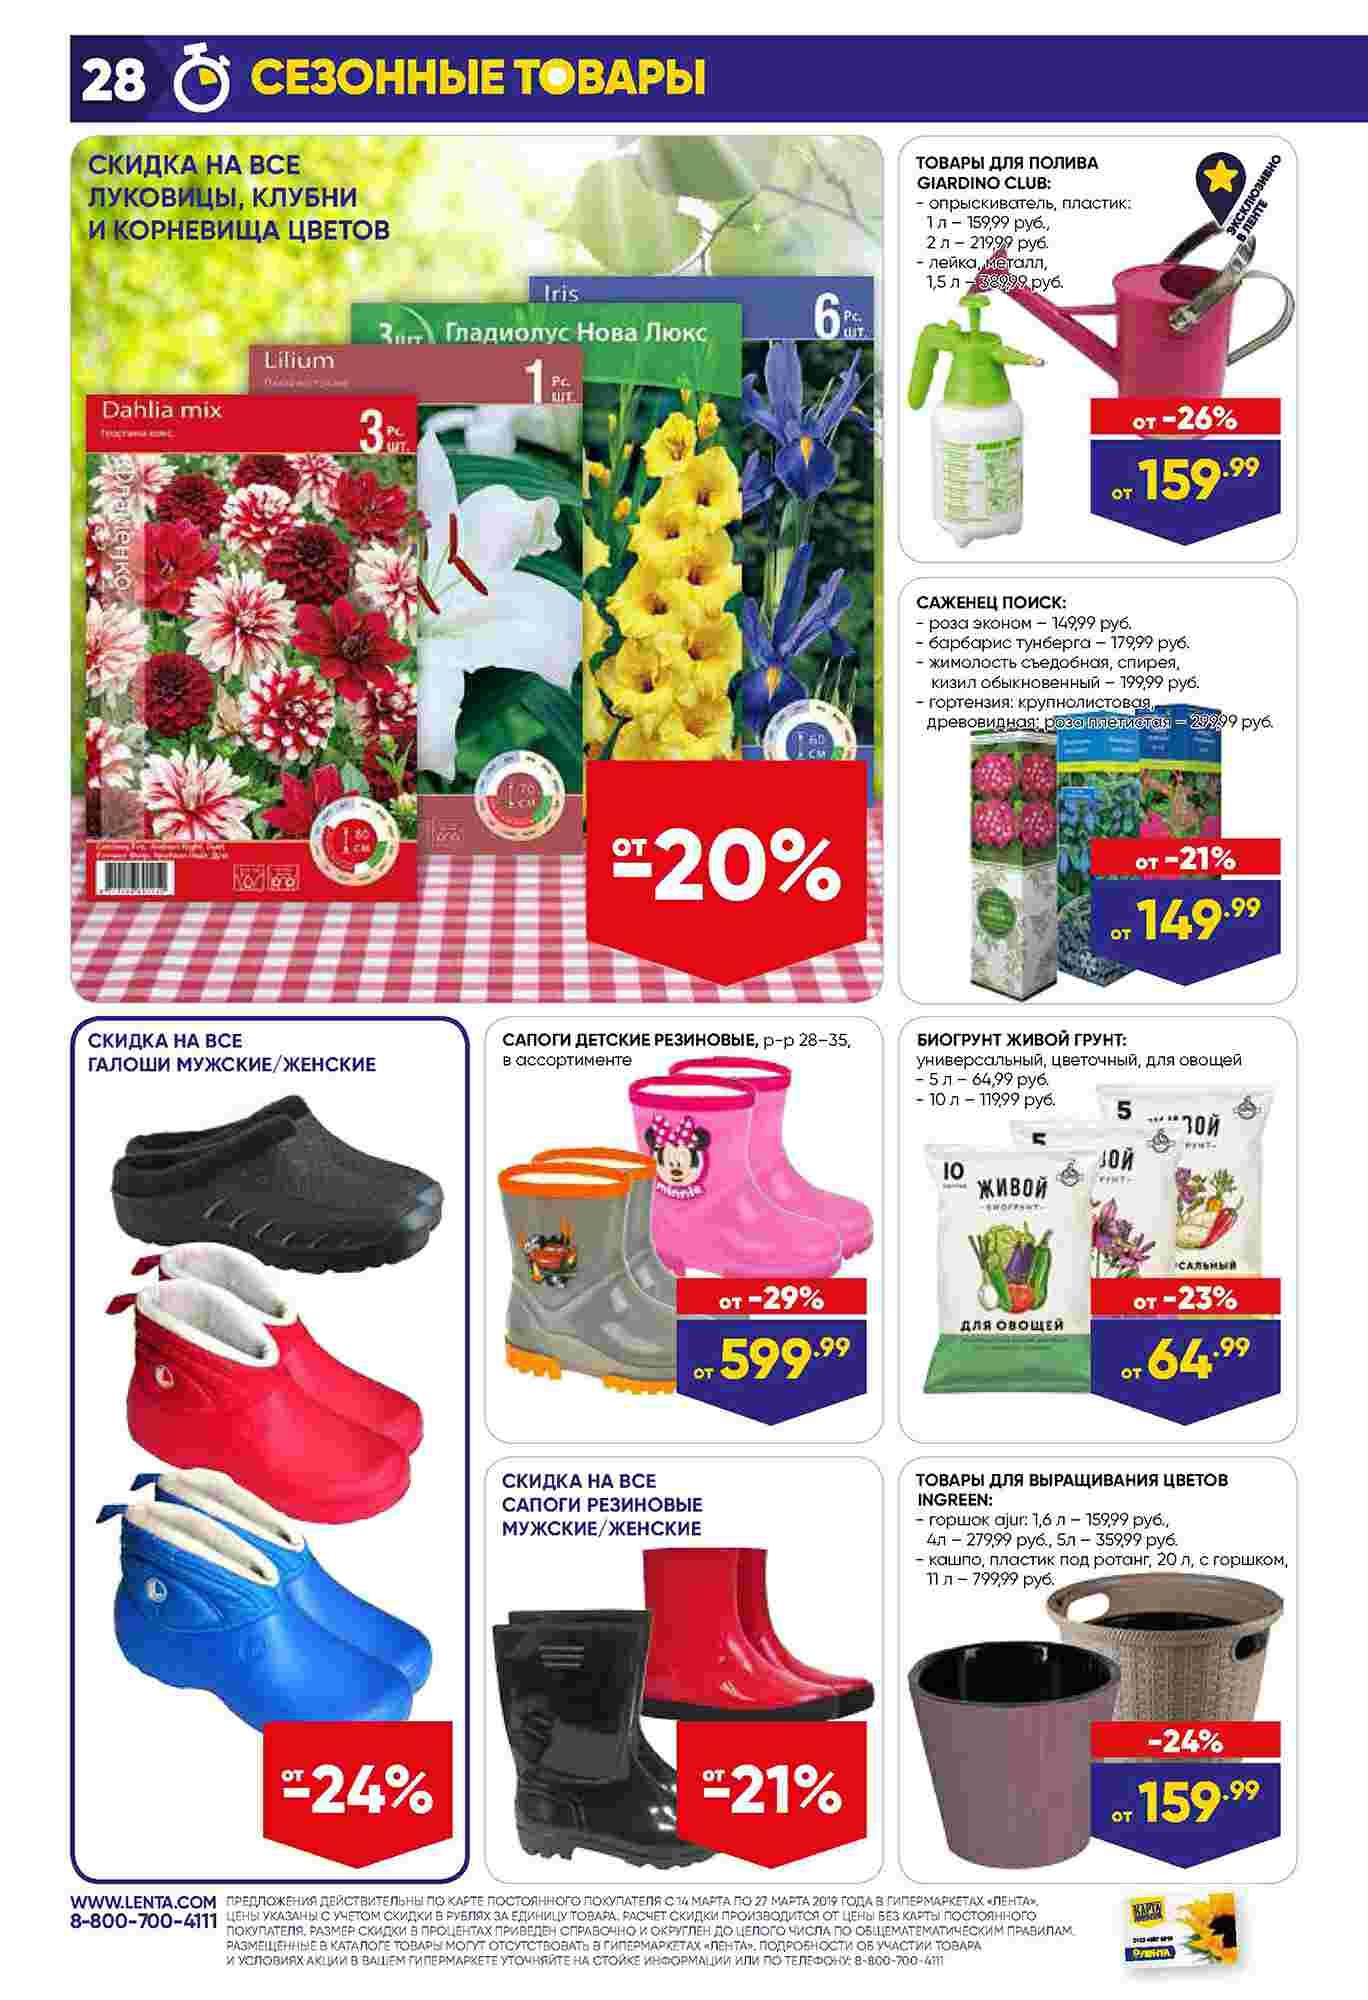 Каталог Лента гипермаркет 14-27.03.2019 стр. - 0001 - 0028